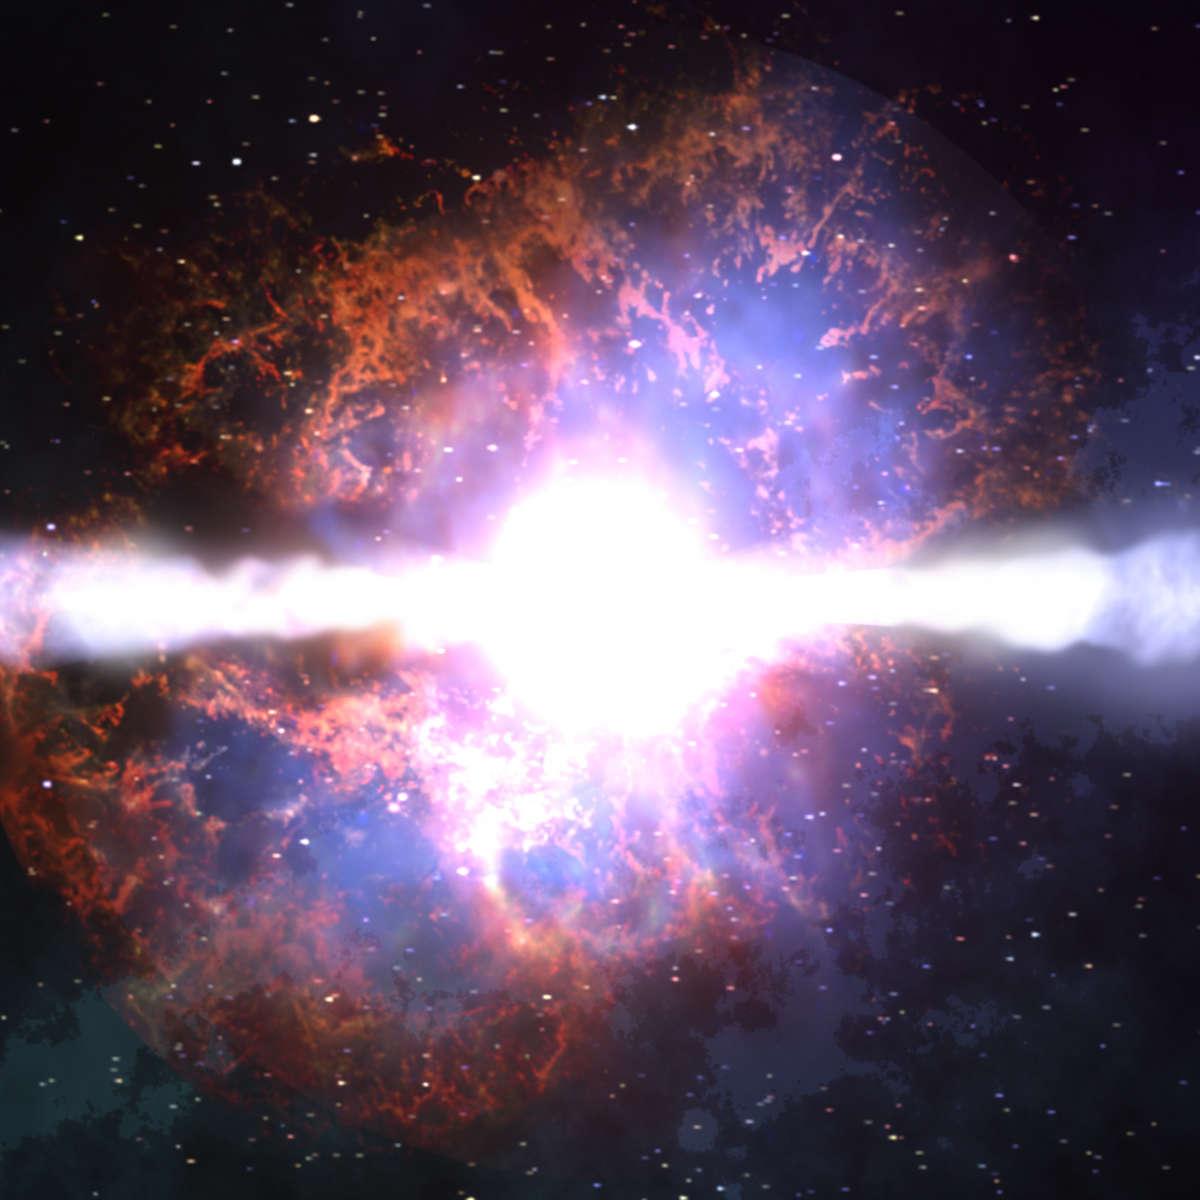 Artwork of a core collapse hypernova, a super-supernova. Credit: NASA/Dana Berry/Skyworks Digital